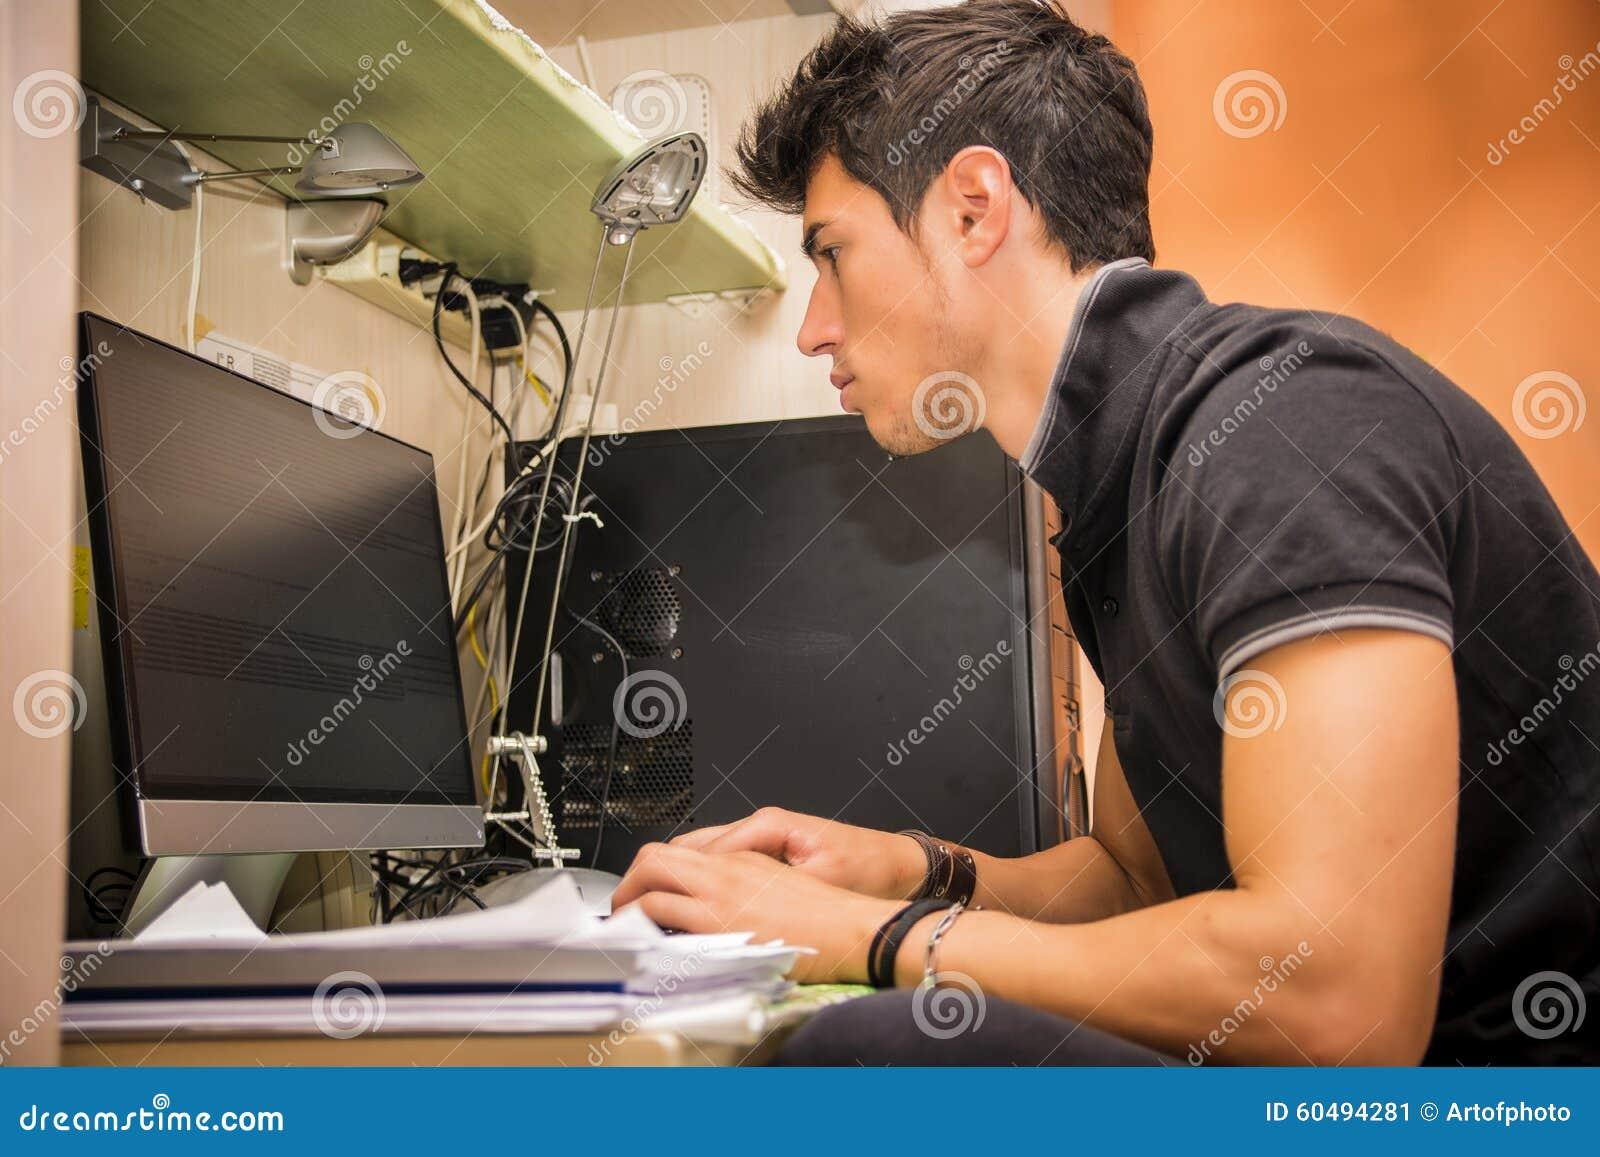 Ugdsb homework help